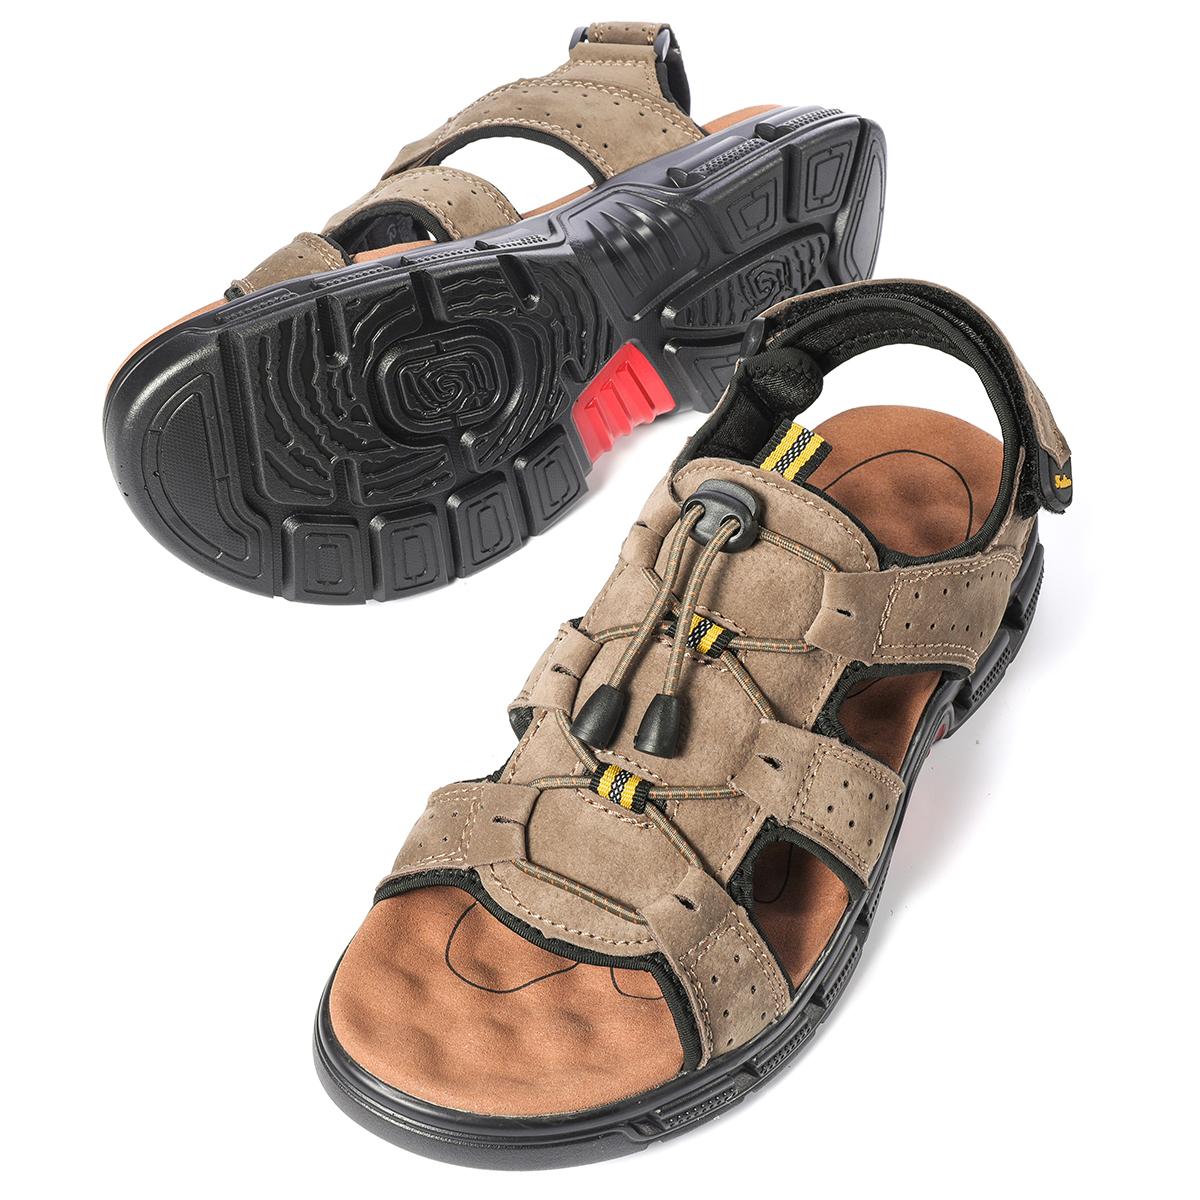 Gracosy Mens Summer Sandals Lightweight Non-Slip Hiking Trekking Walking Flat Sandals Shoes Athletic Outdoor Sport Sandals Casual Beach Fisherman Sandals